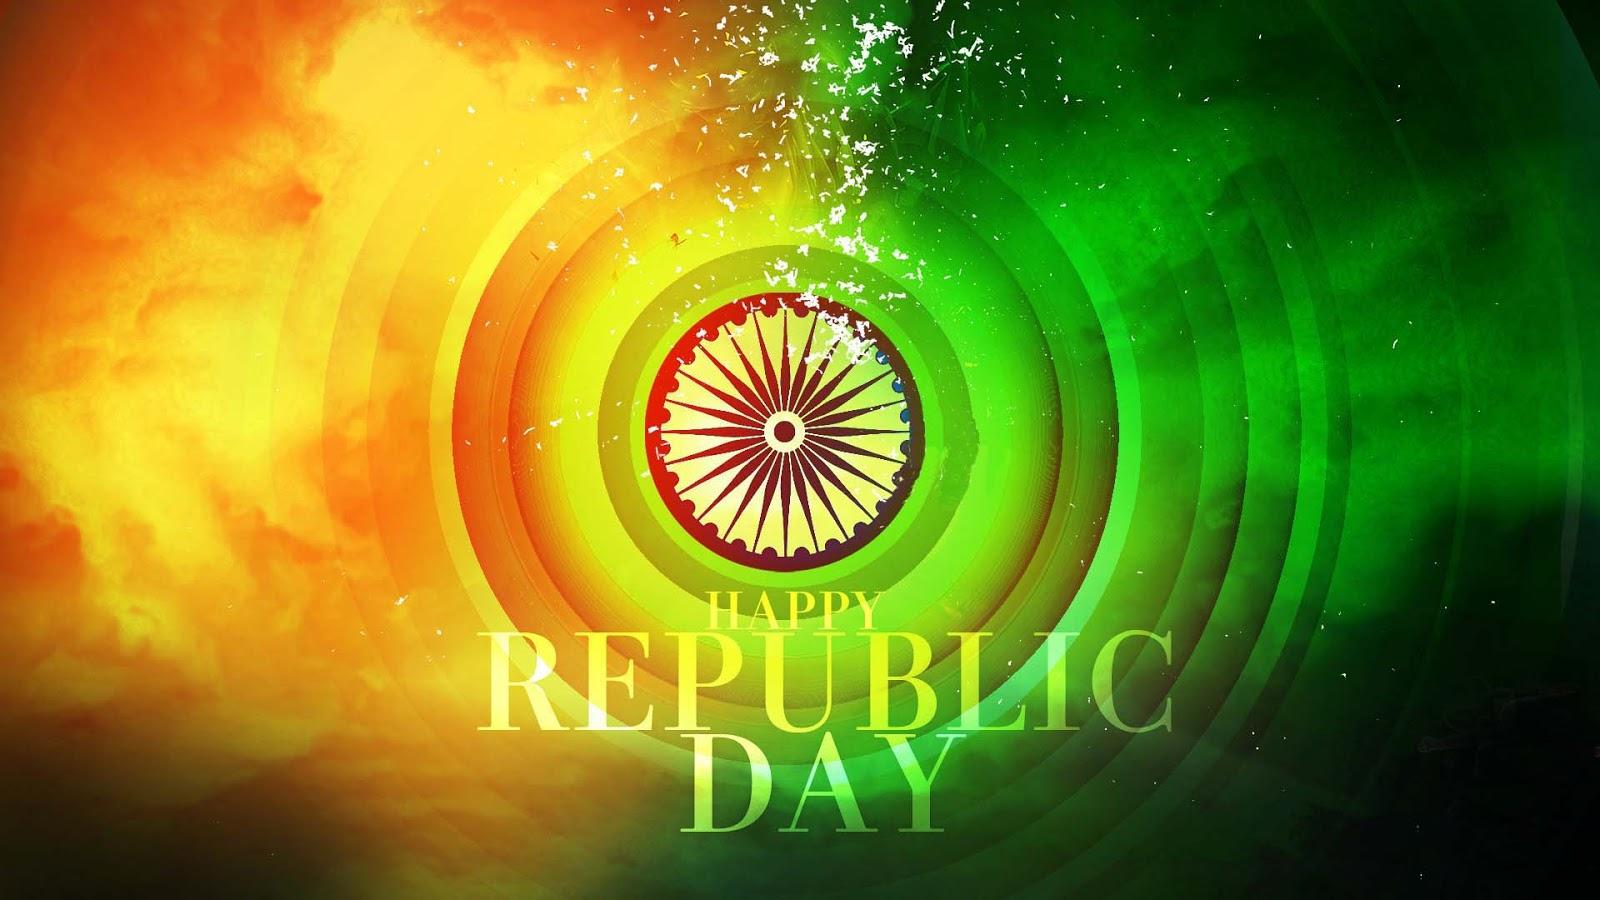 Wallpaper download for whatsapp - Happy Republic Day 2017 Hd Pics